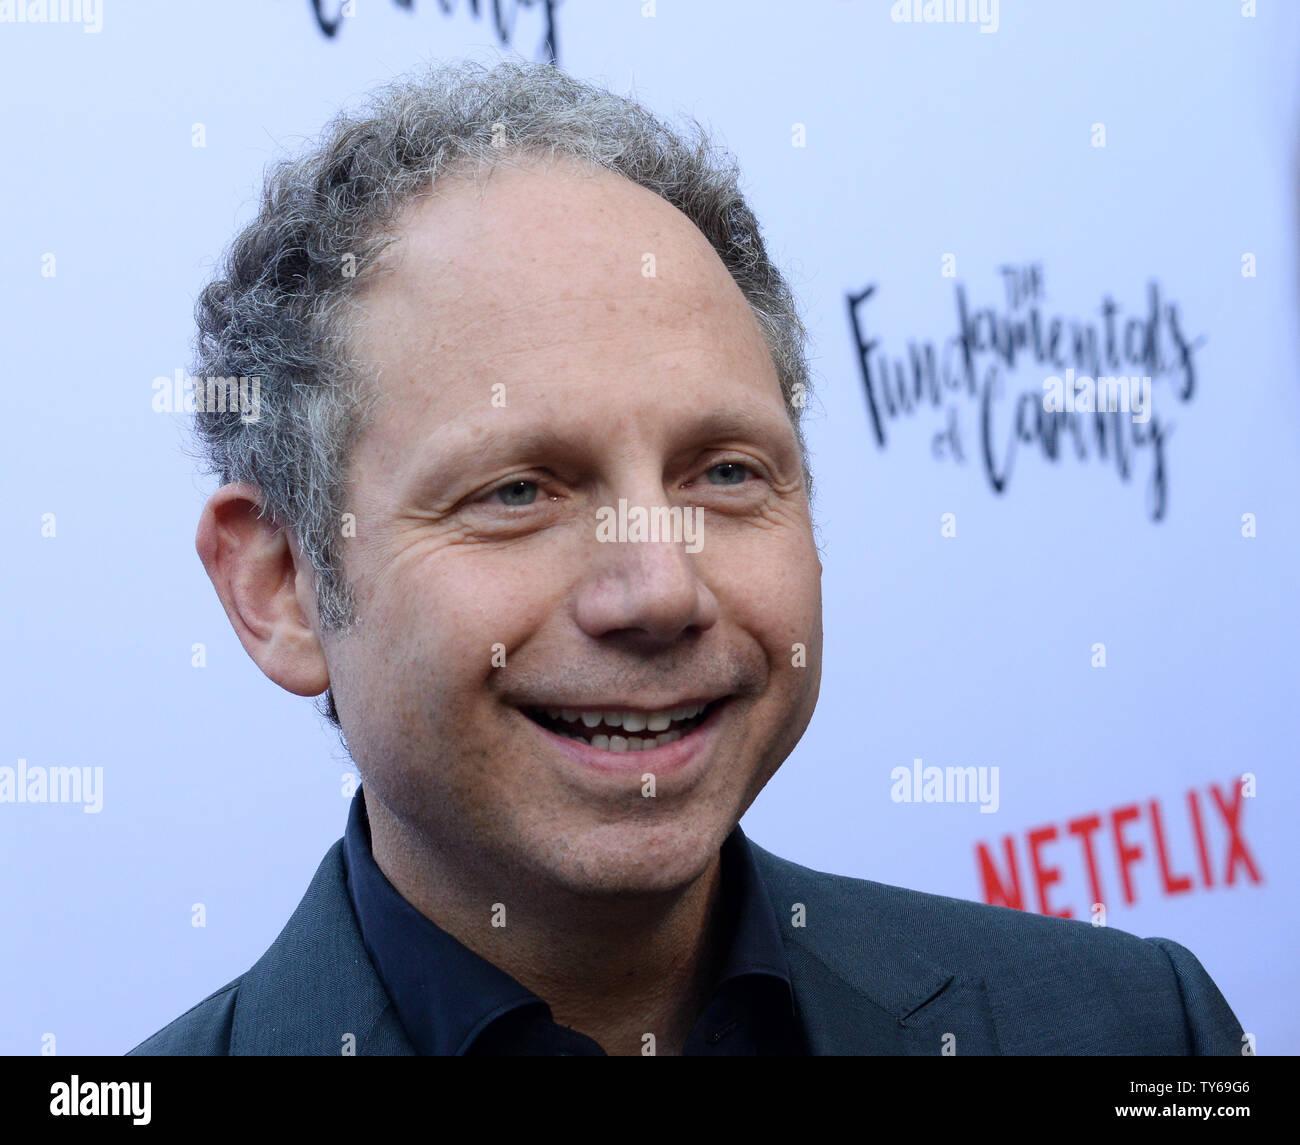 Director Rob Burnett attend a screening of his new Netflix